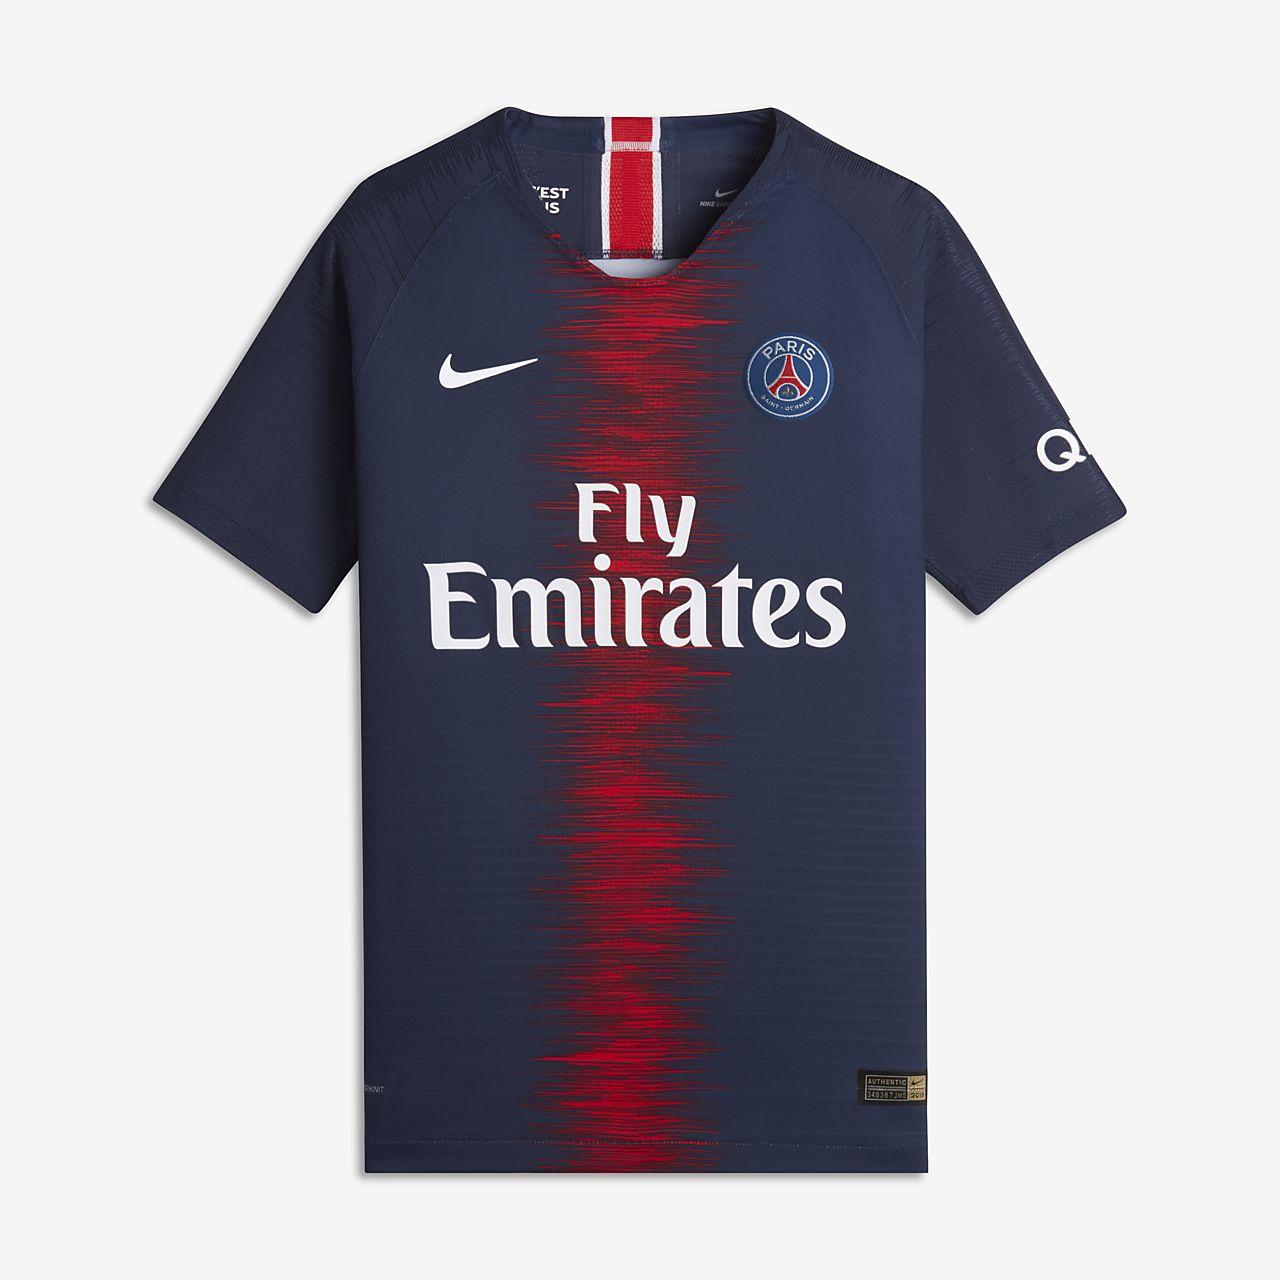 2018/19 Paris Saint-Germain Vapor Match Home fotballdrakt til store barn